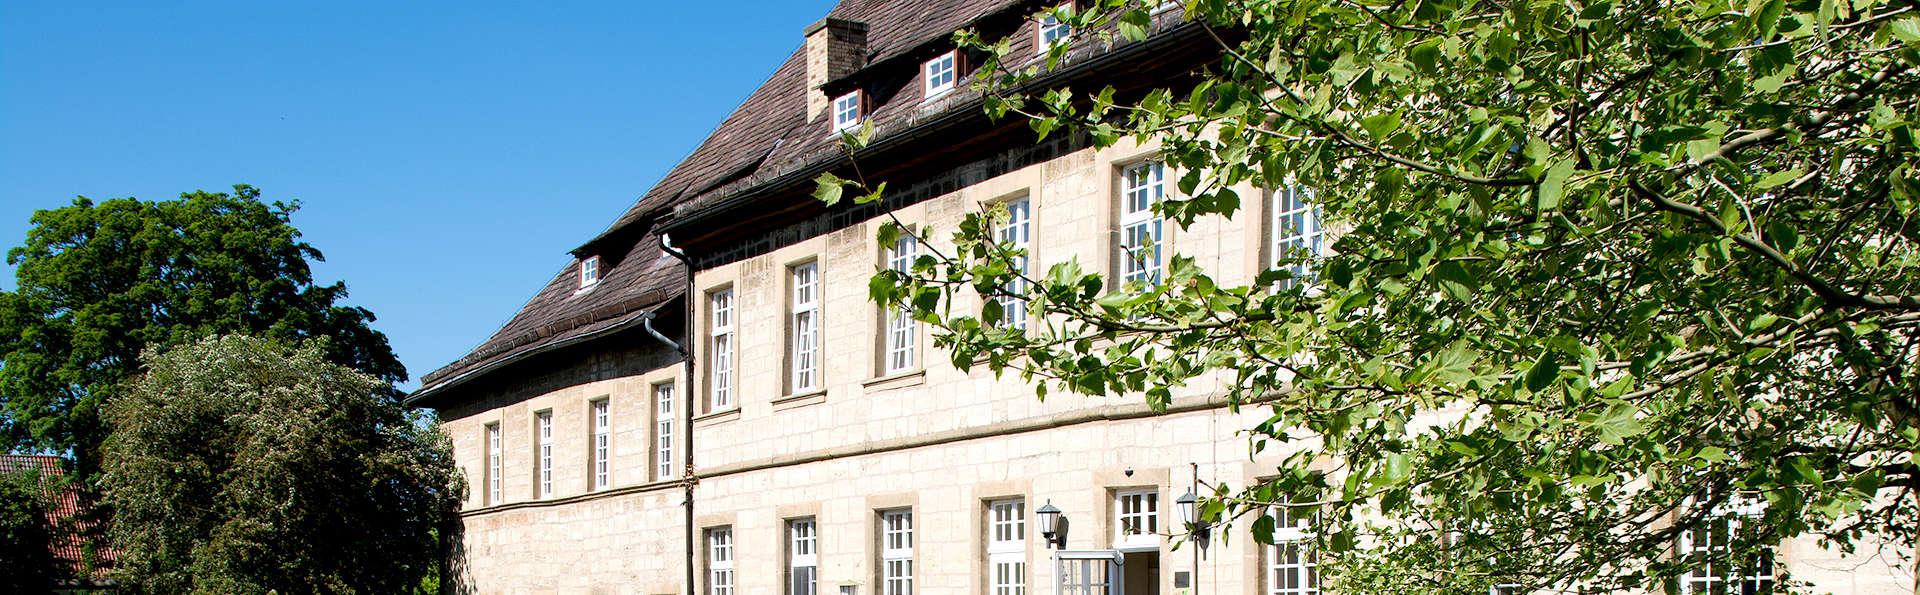 Hotel Schloß Gehrden  - EDIT_NEW_FRONT2.jpg